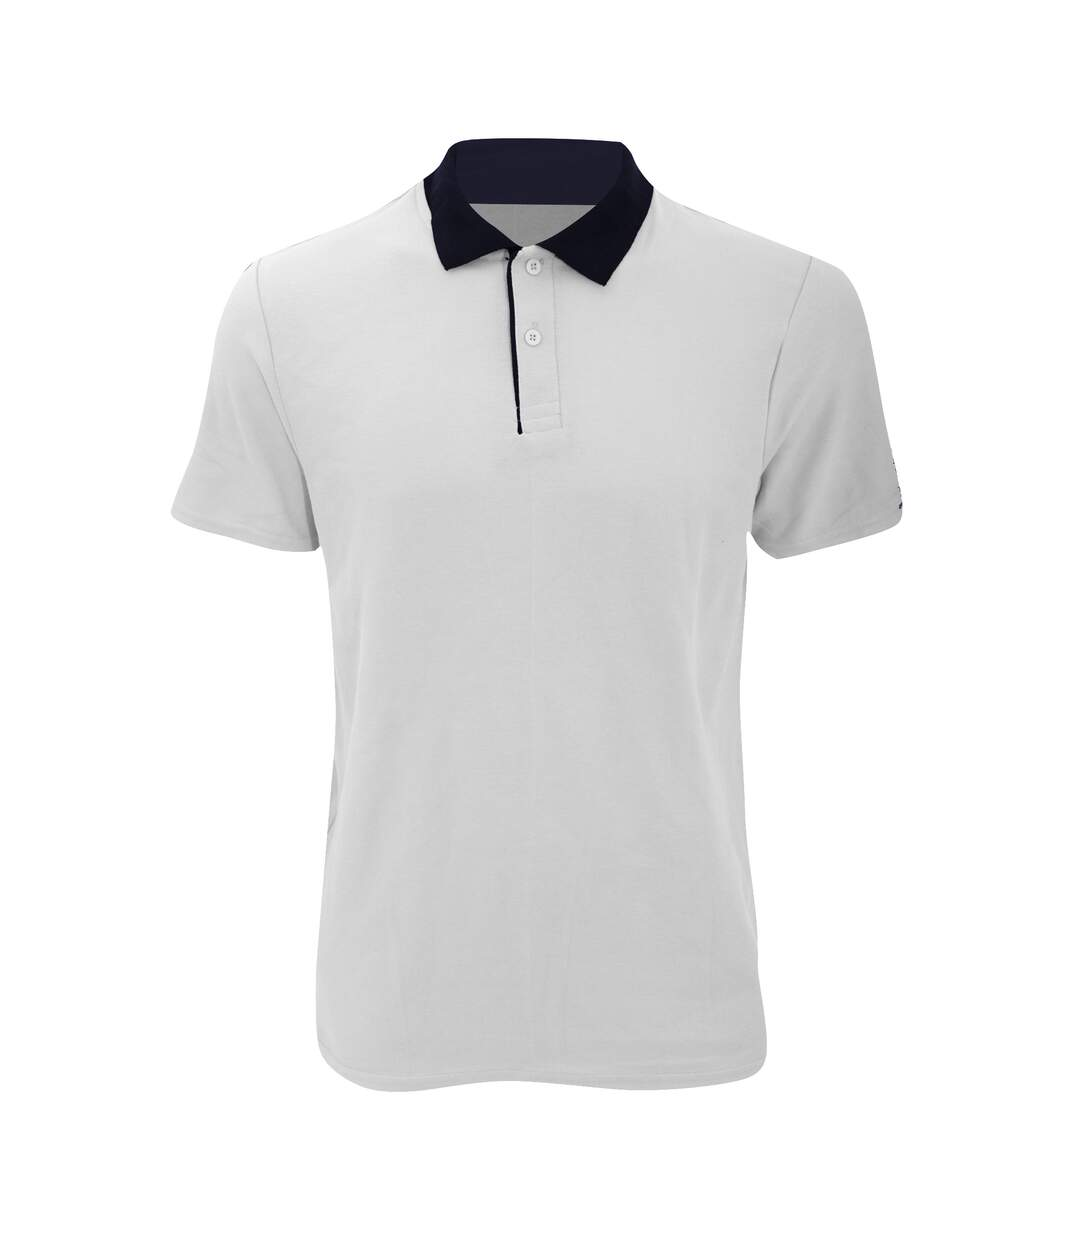 Anvil Mens Fashion Double Pique Plain Polo Shirt (210 GSM) (White/ Navy) - UTRW2535